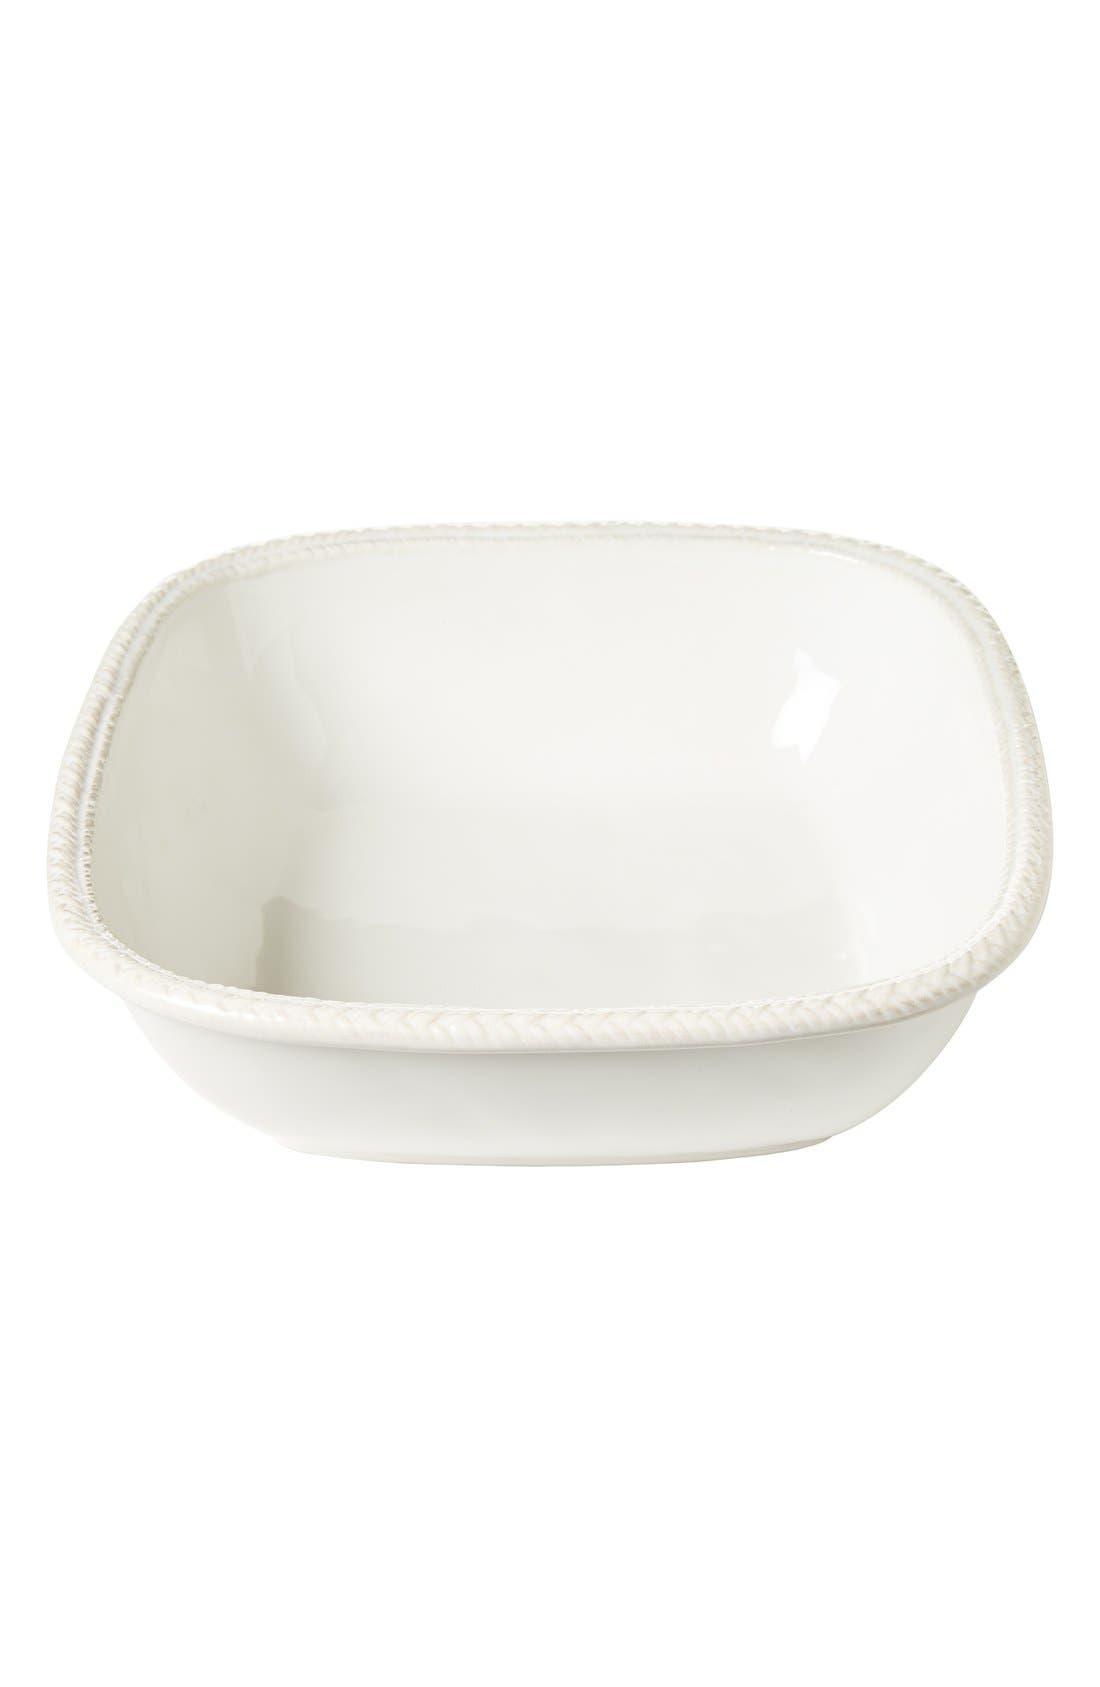 JULISKA,                             Le Panier Medium Ceramic Serving Bowl,                             Main thumbnail 1, color,                             WHITE